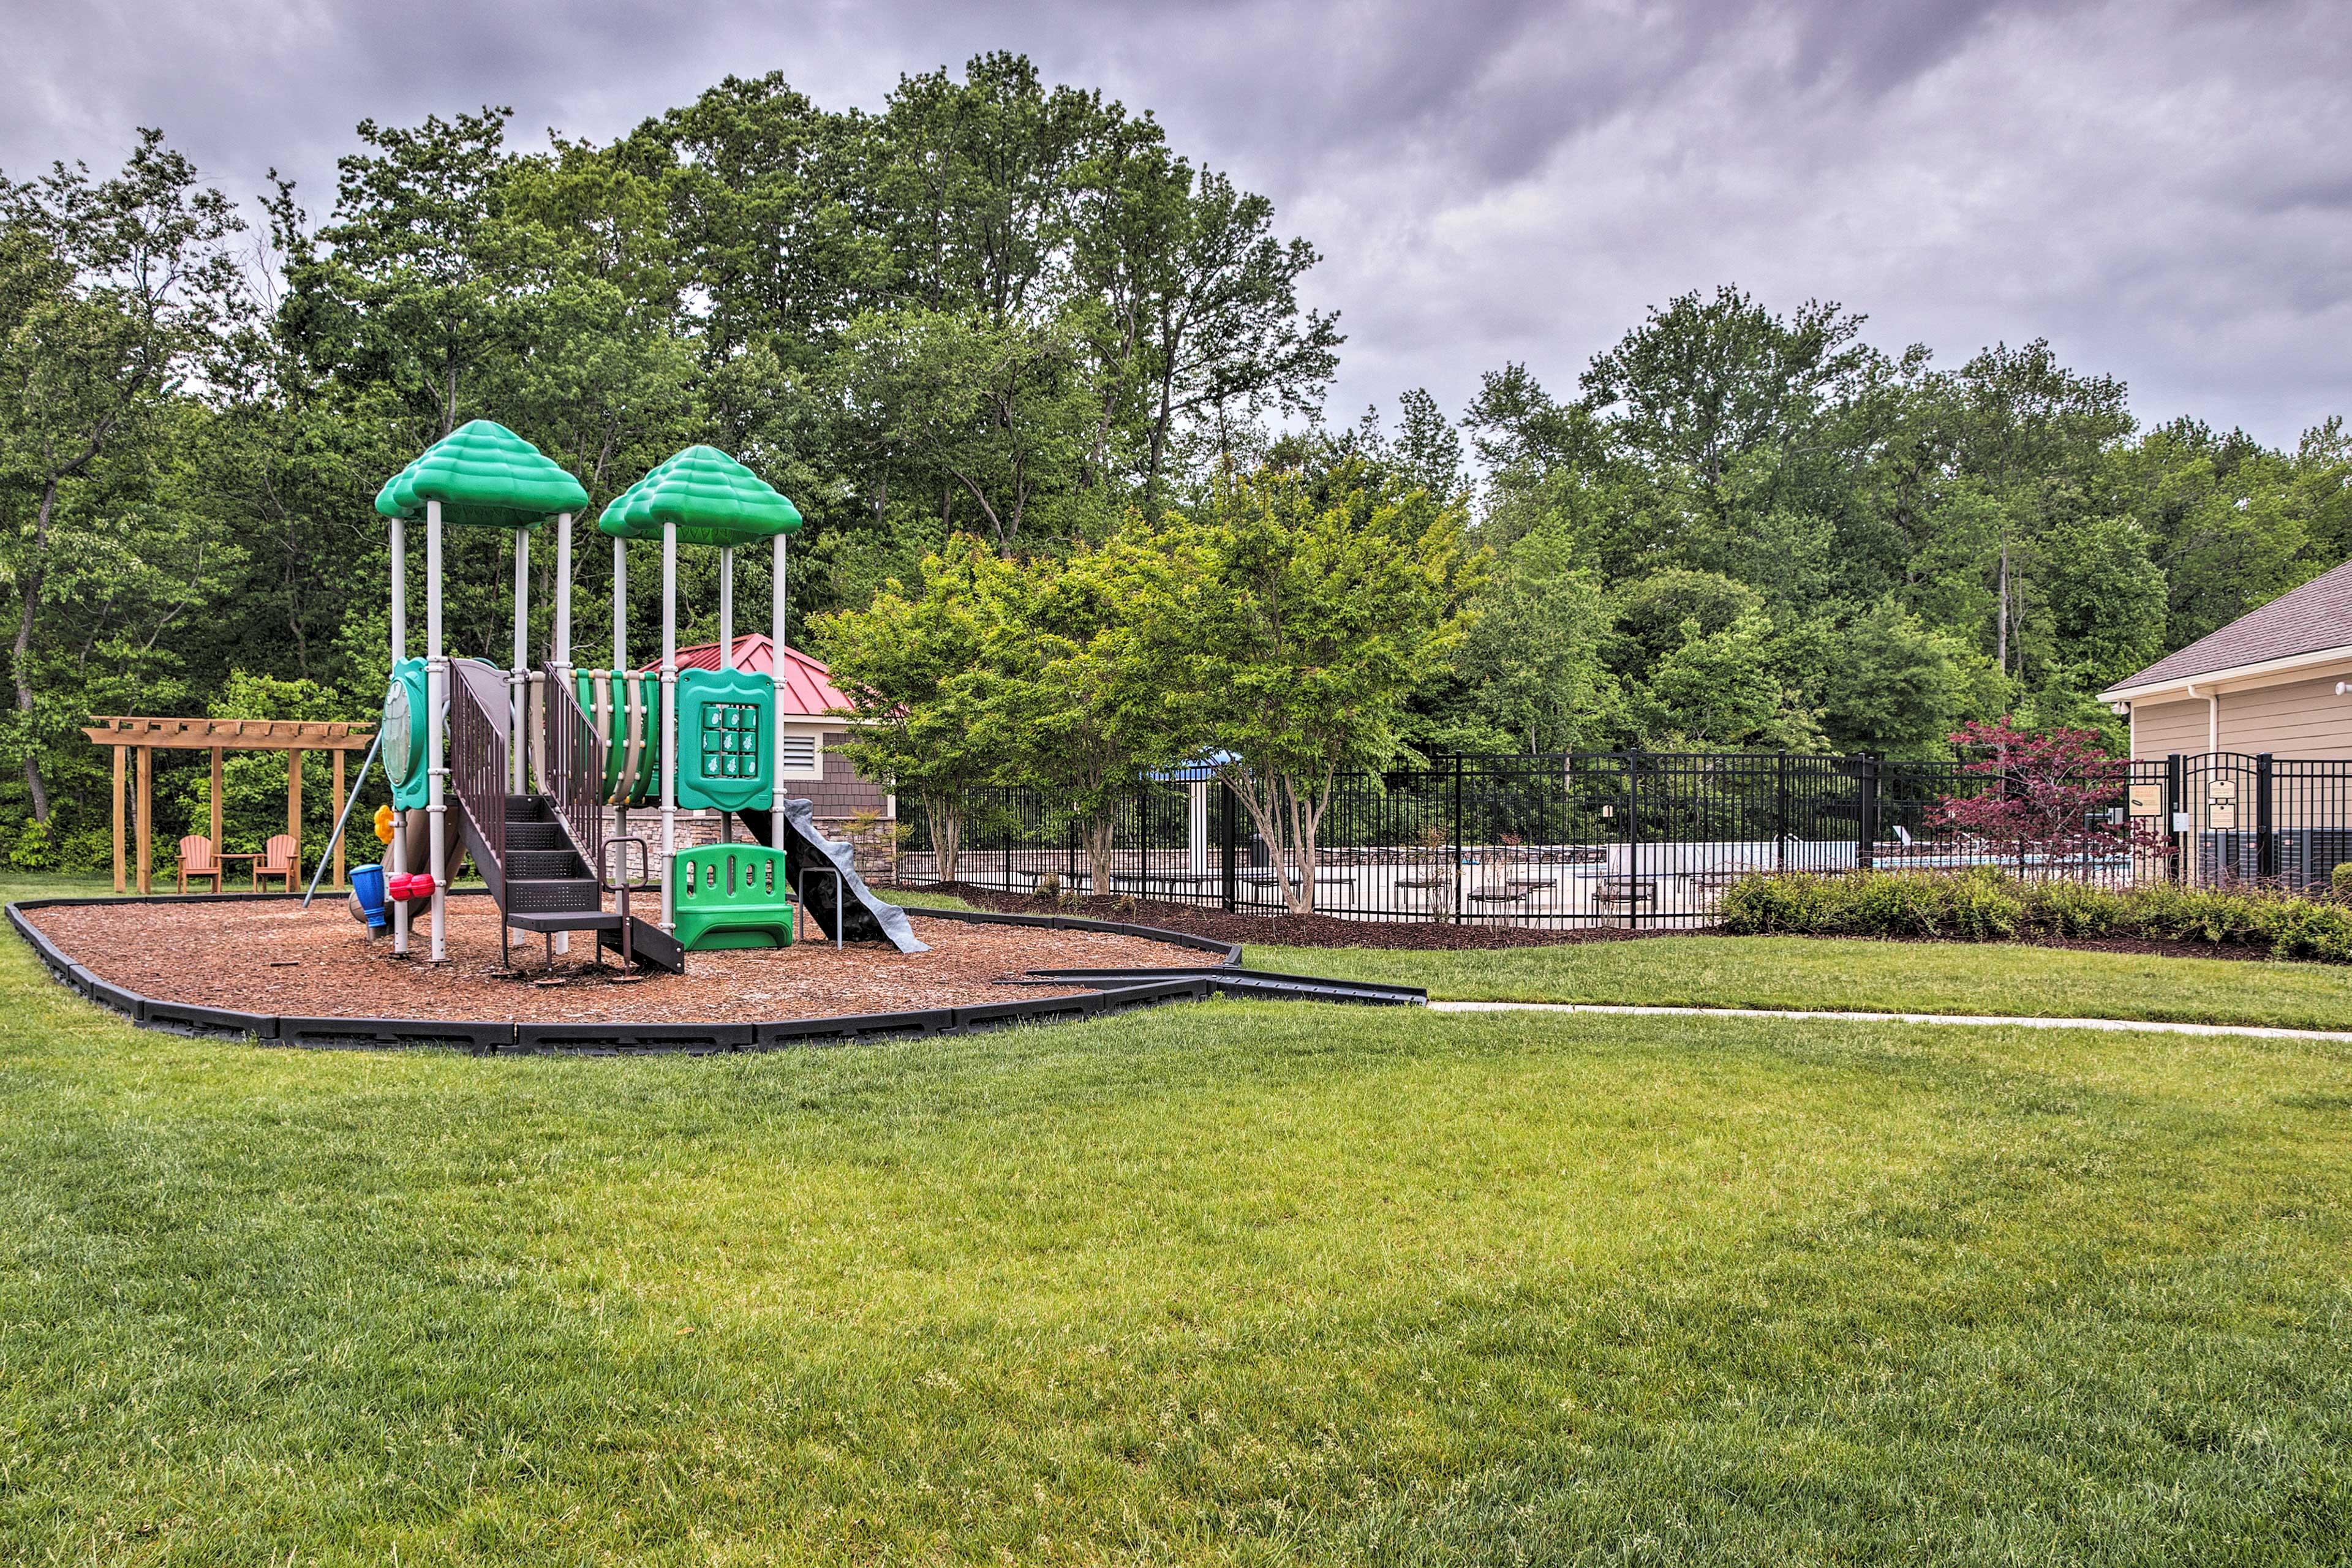 The kids will love the playground.